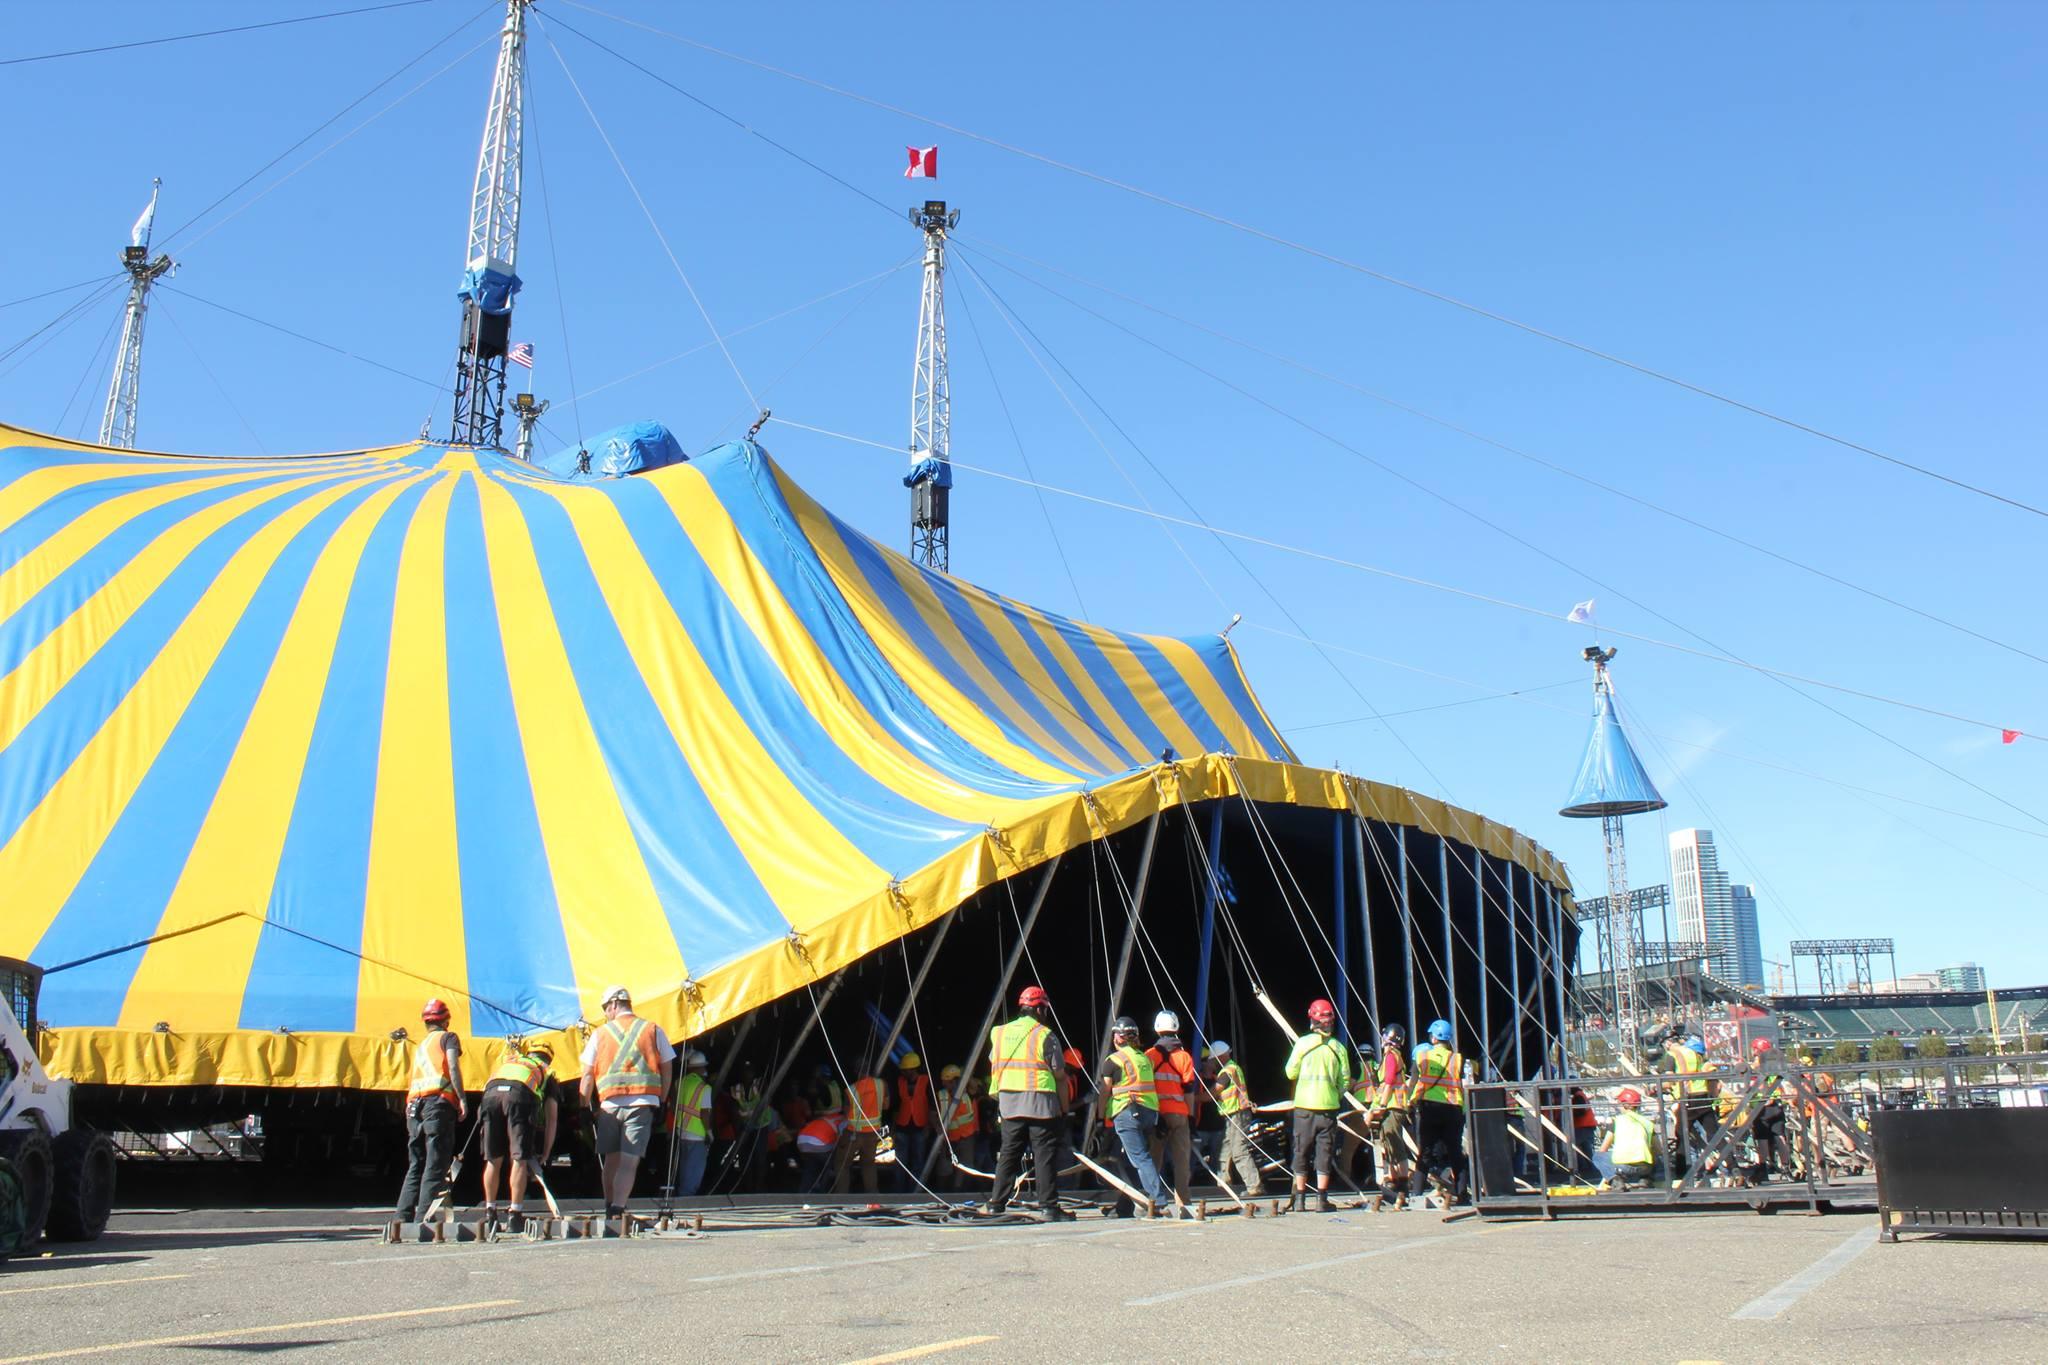 ATT-Park-Big-Top-Cirque-San-Francisco.jpg